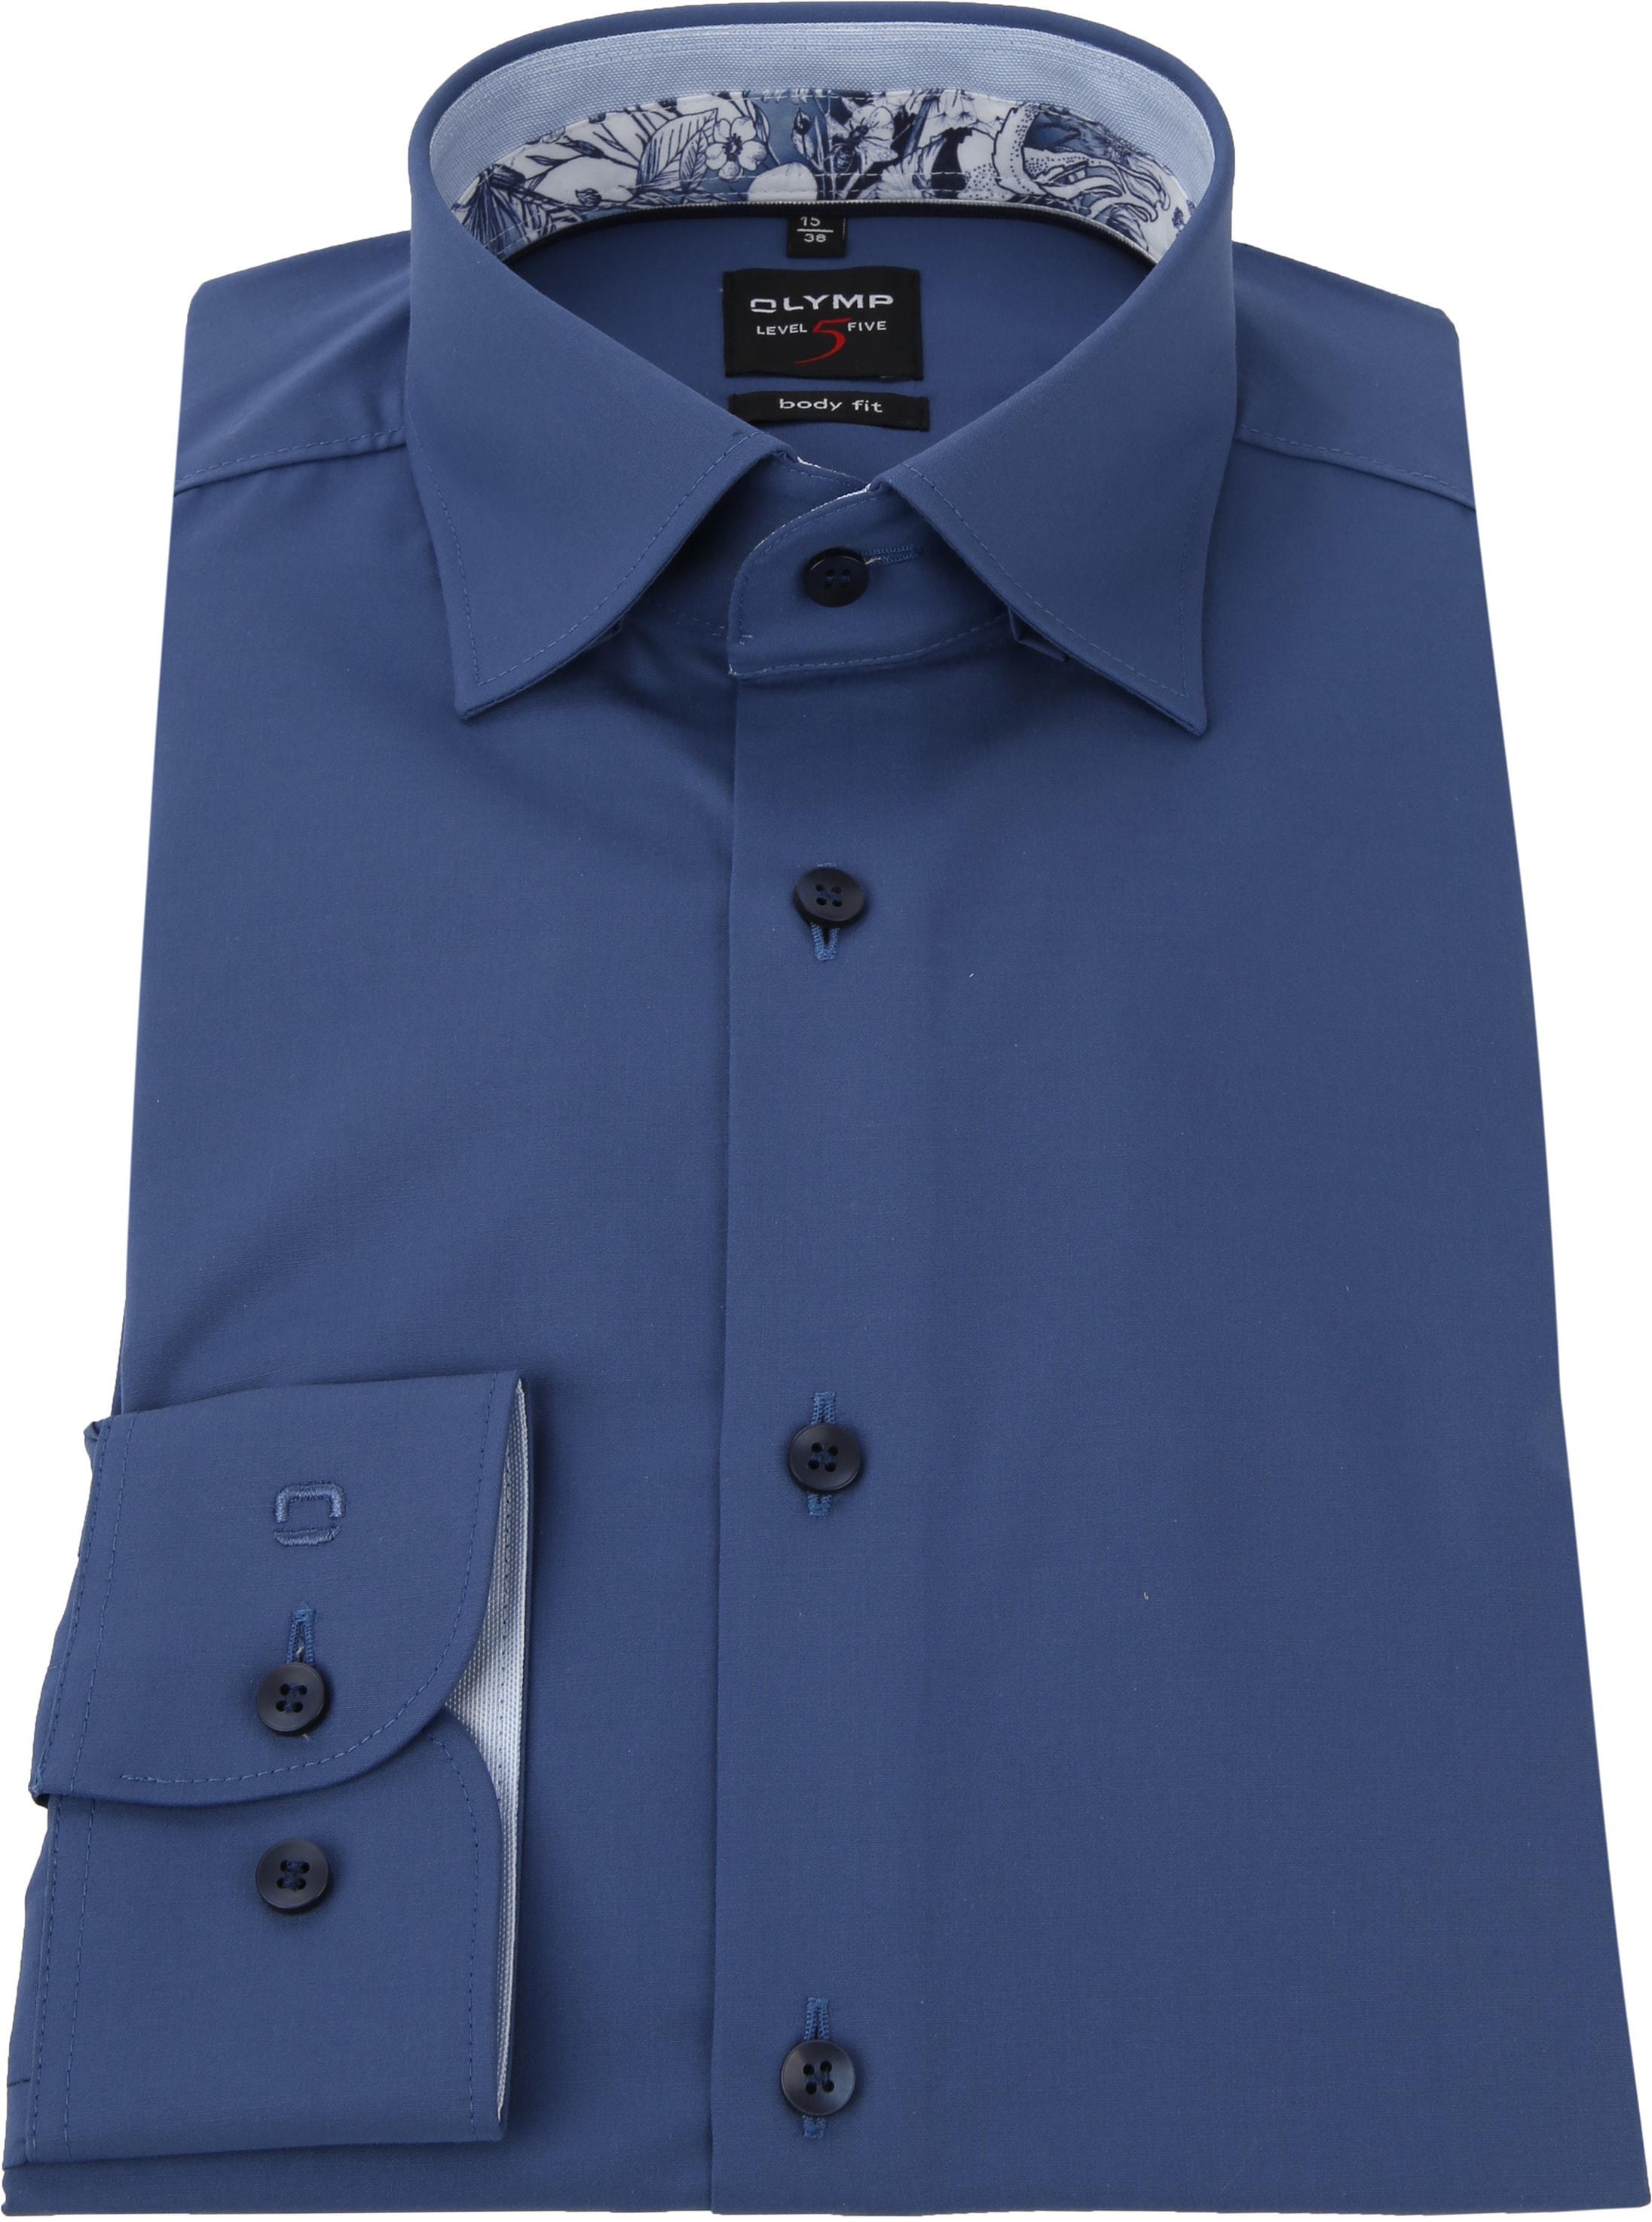 OLYMP Overhemd BF Level 5 Blauw foto 2